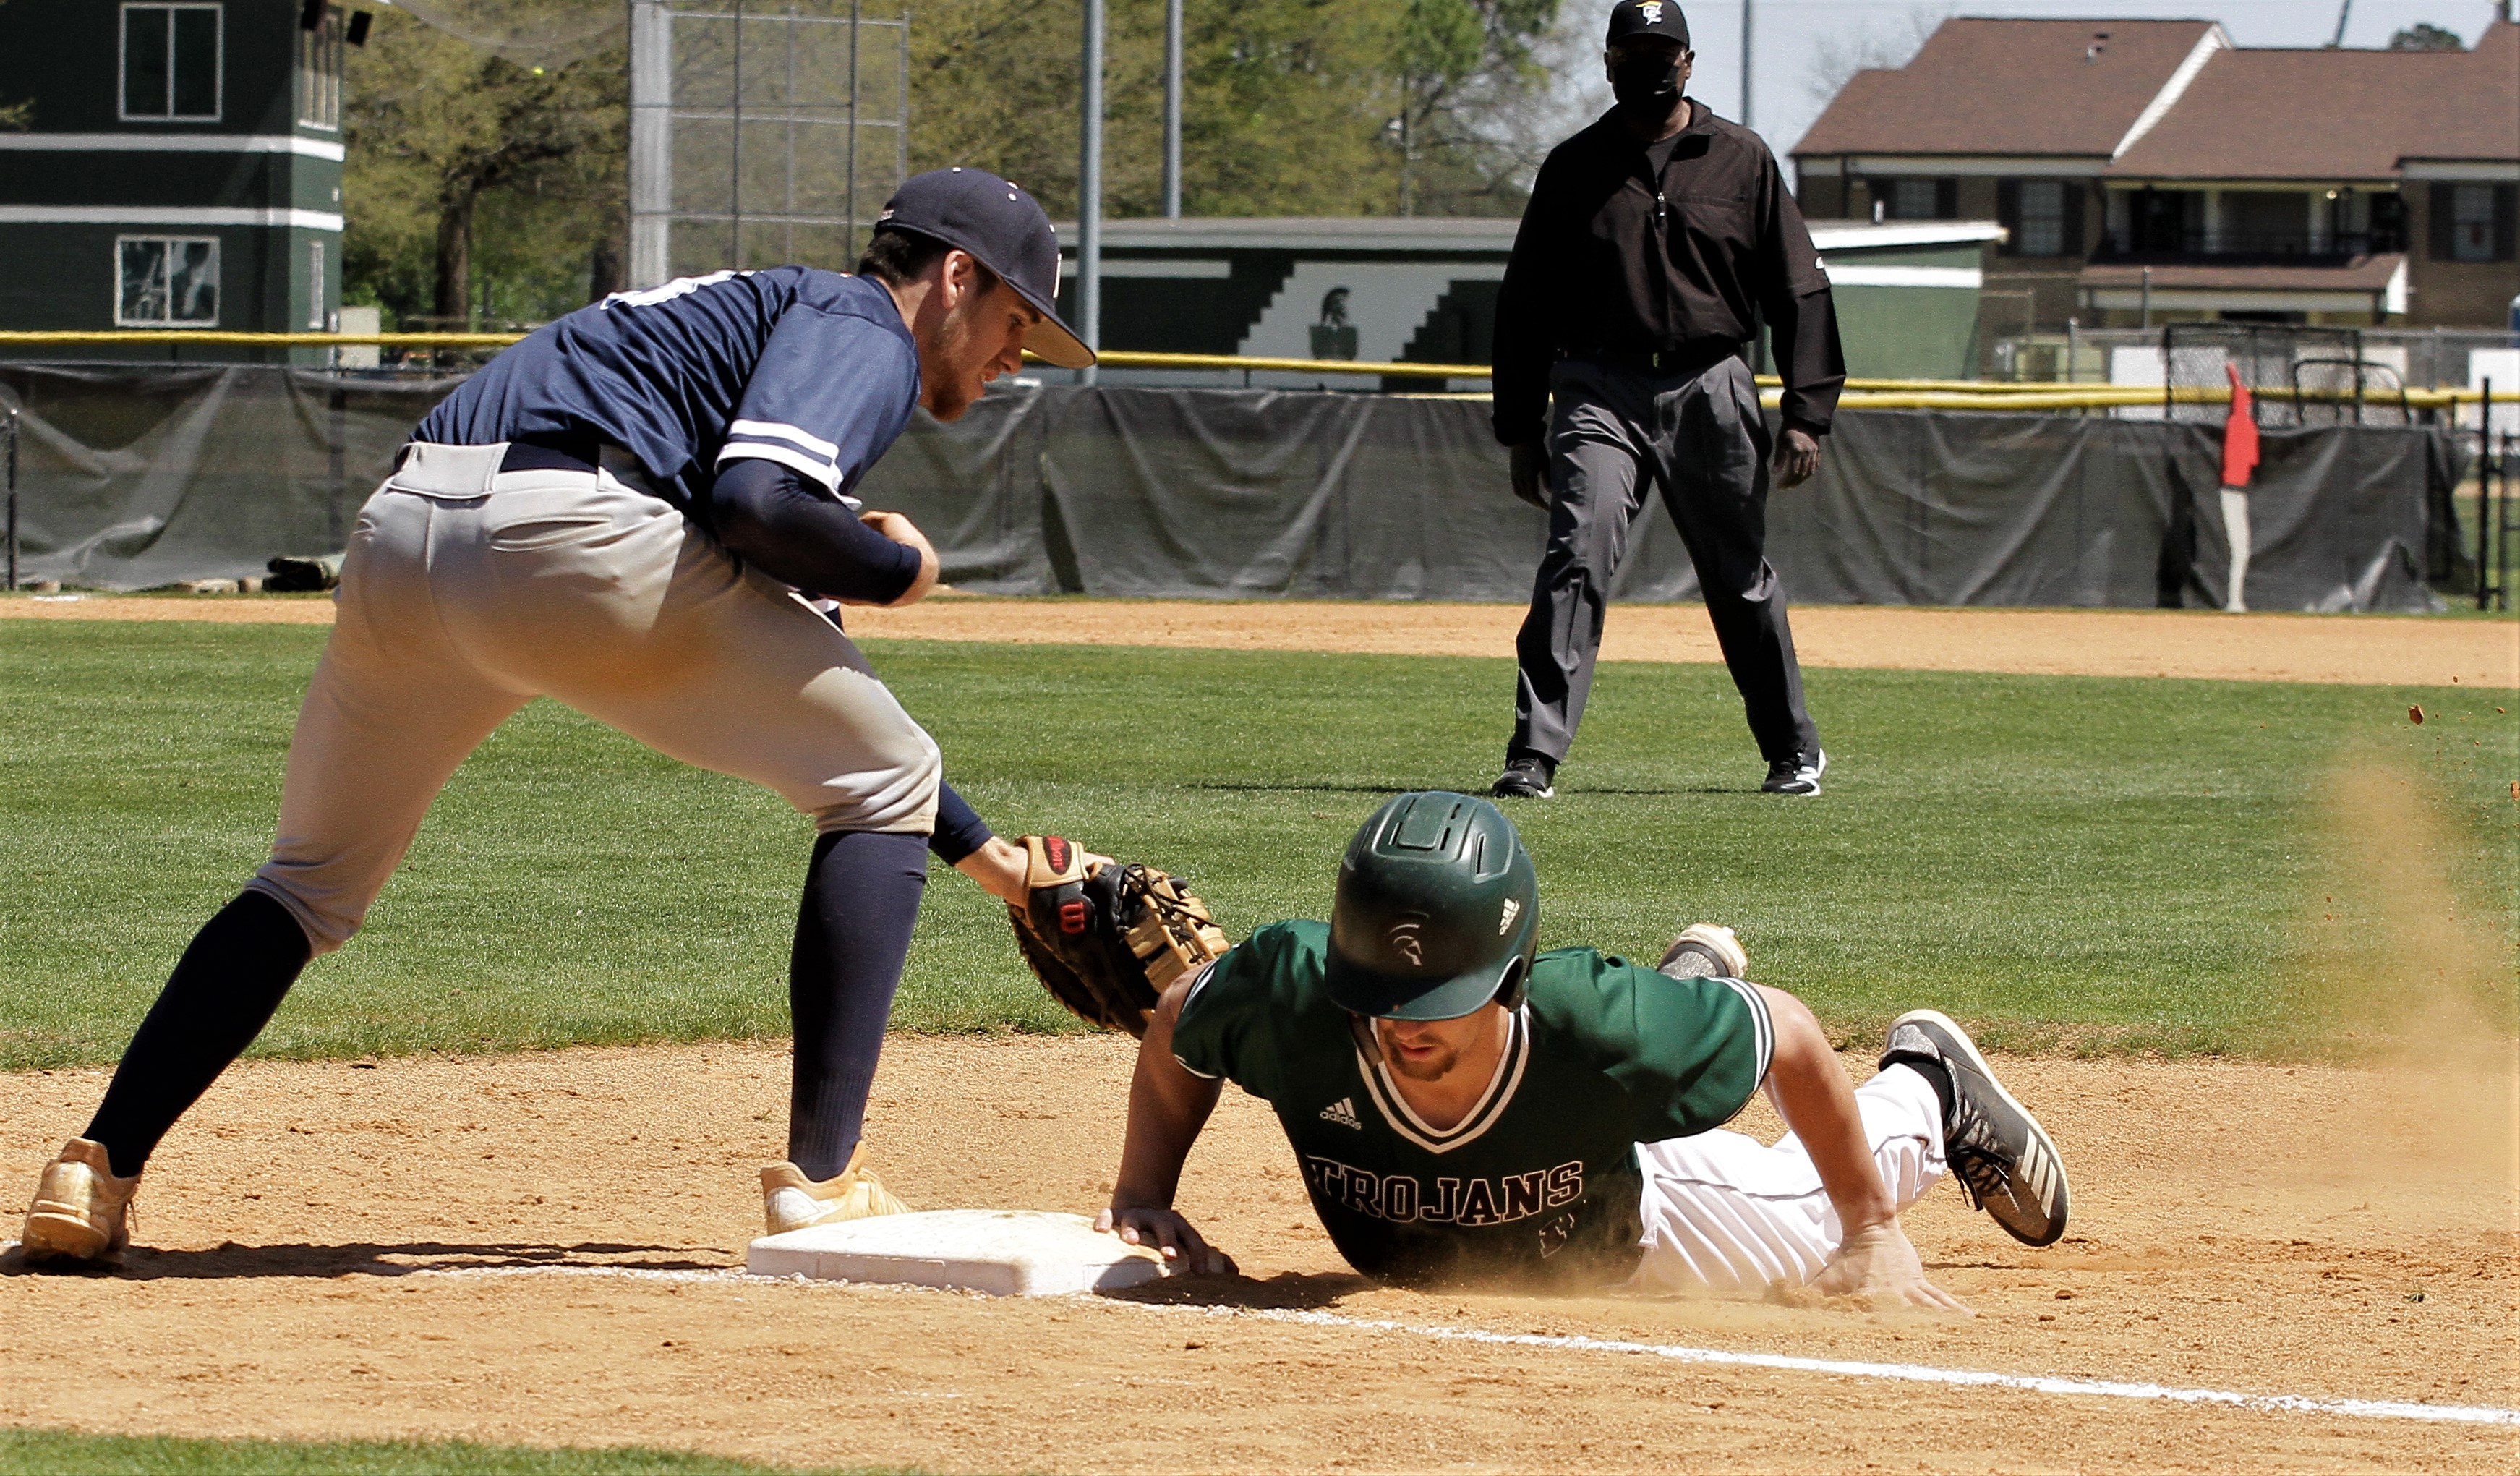 Baseball: Emmanuel College Vs. UMO (PHOTO GALLERY)